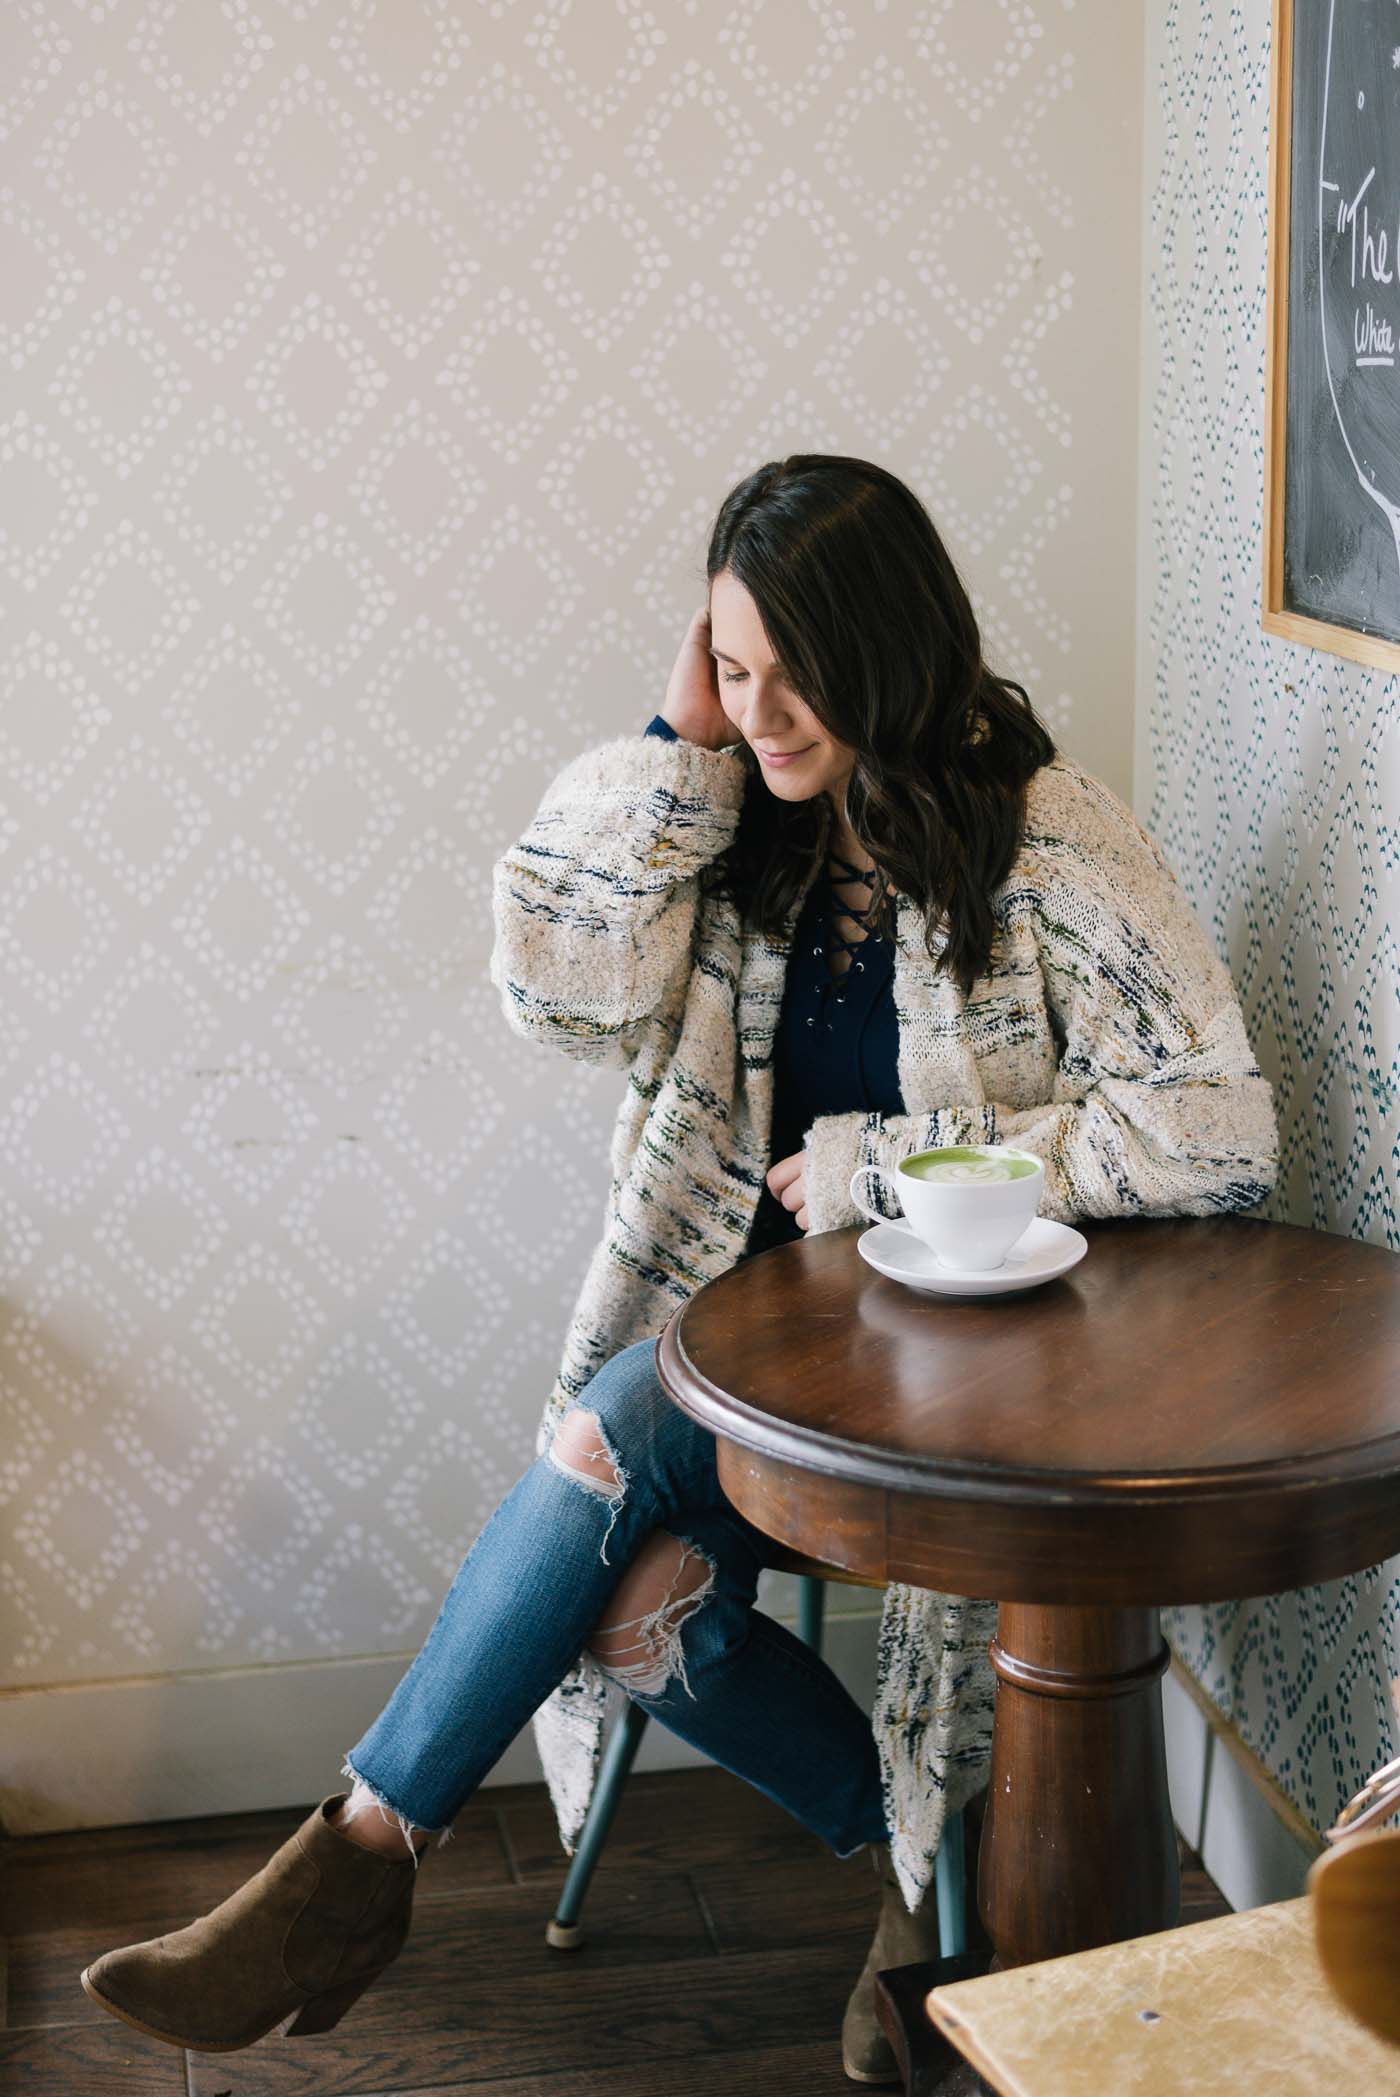 anthropologie cardigan, fall outfit ideas, coffee photos, matcha latte - My Style Vita @mystylevita